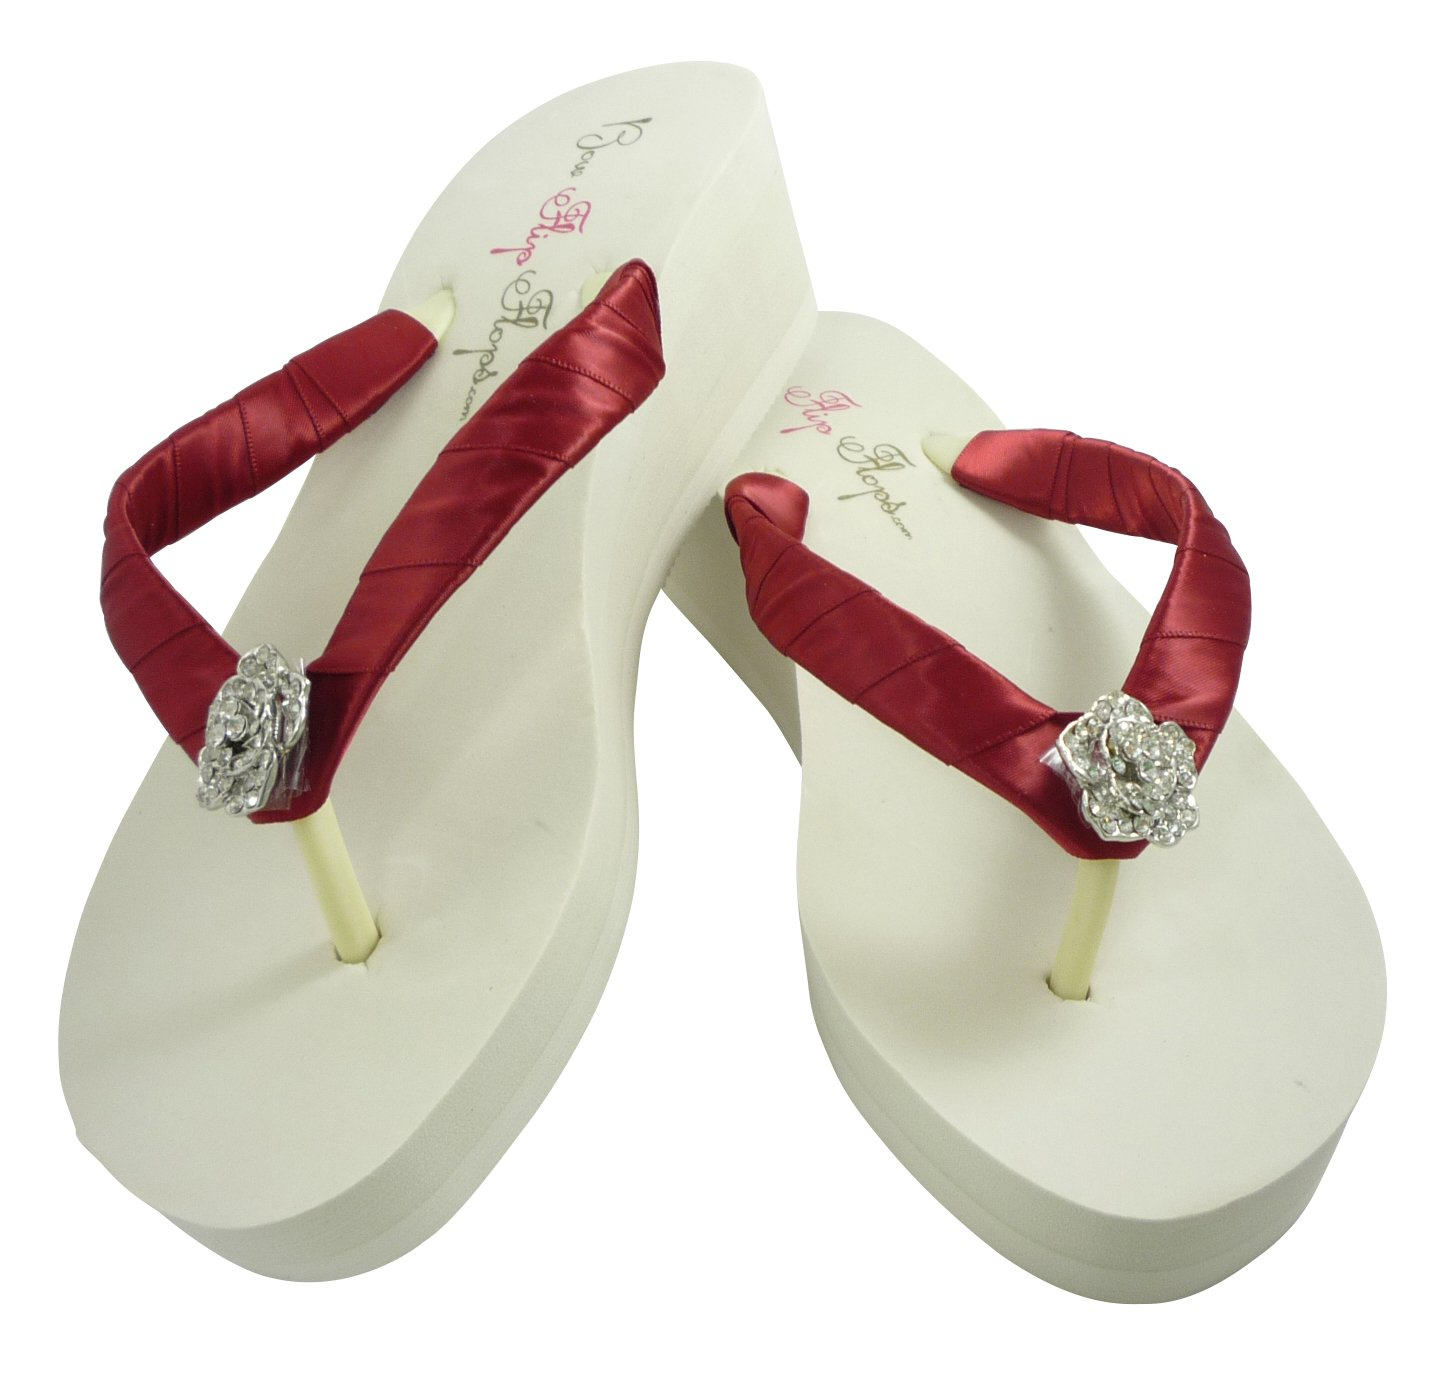 8d209d2728eed Amazon.com  Scarlet Red Rose Flip Flops - Bridal or Bridesmaid Sandals